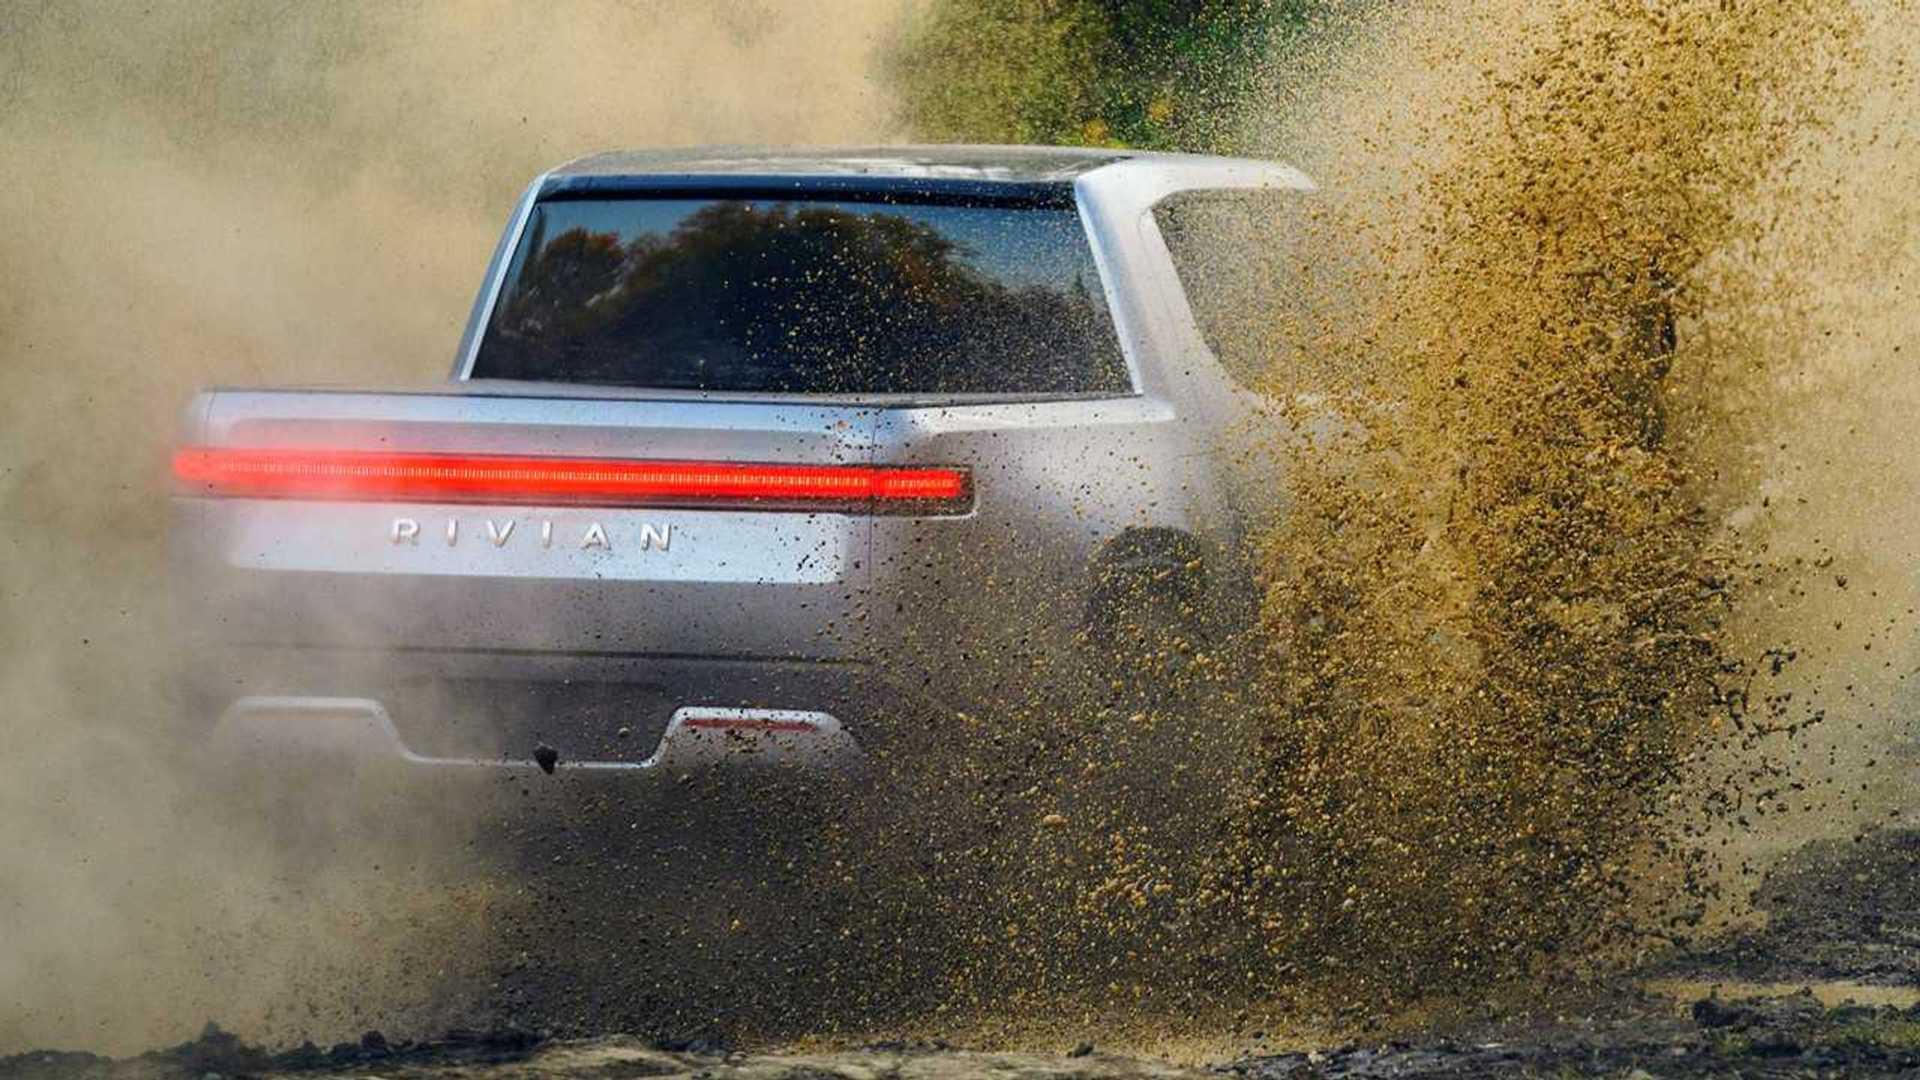 Rivian Confirms Launch Of R1T Truck, R1S SUV In Australia